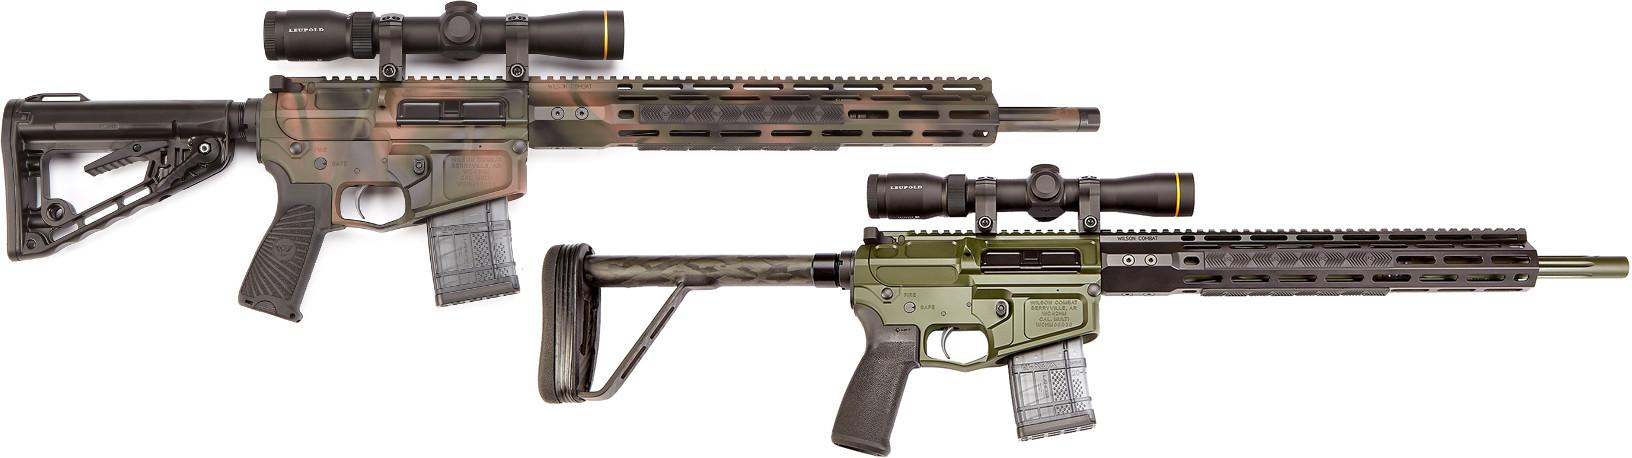 Wilson Combat\u0027s new 458 HAM\u0027R \u2013 Hot Hybrid Pushes the Limits